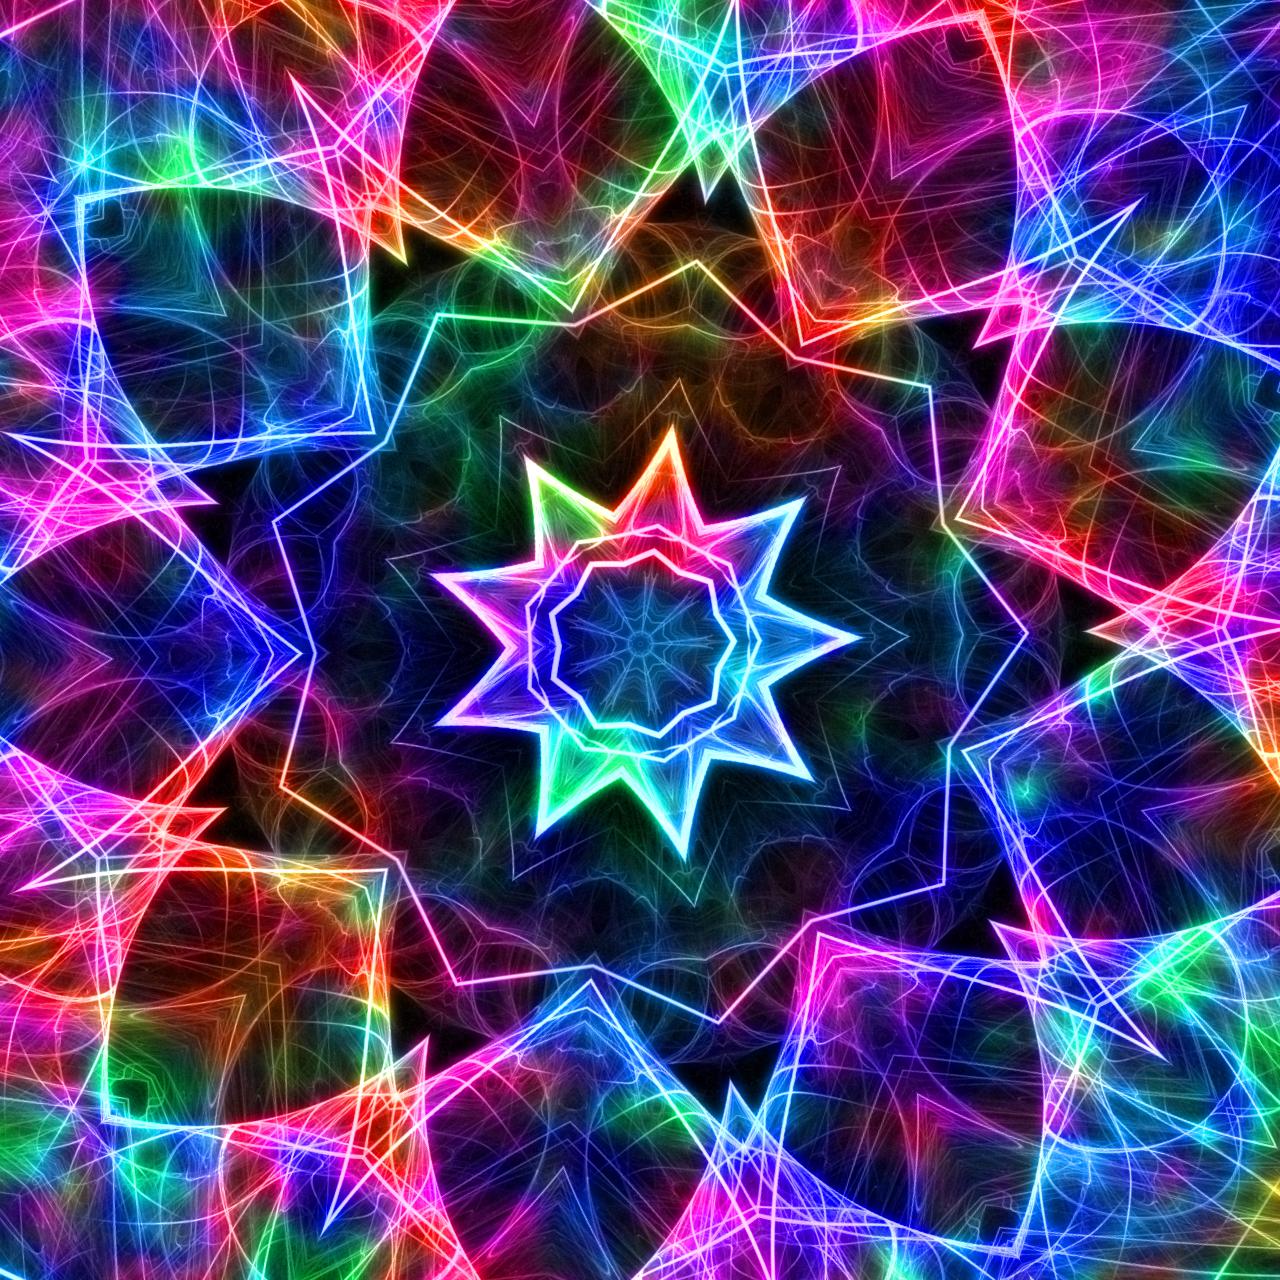 Kaleidoscope 5 Fractal Art Kaleidoscope Images Colorful Art